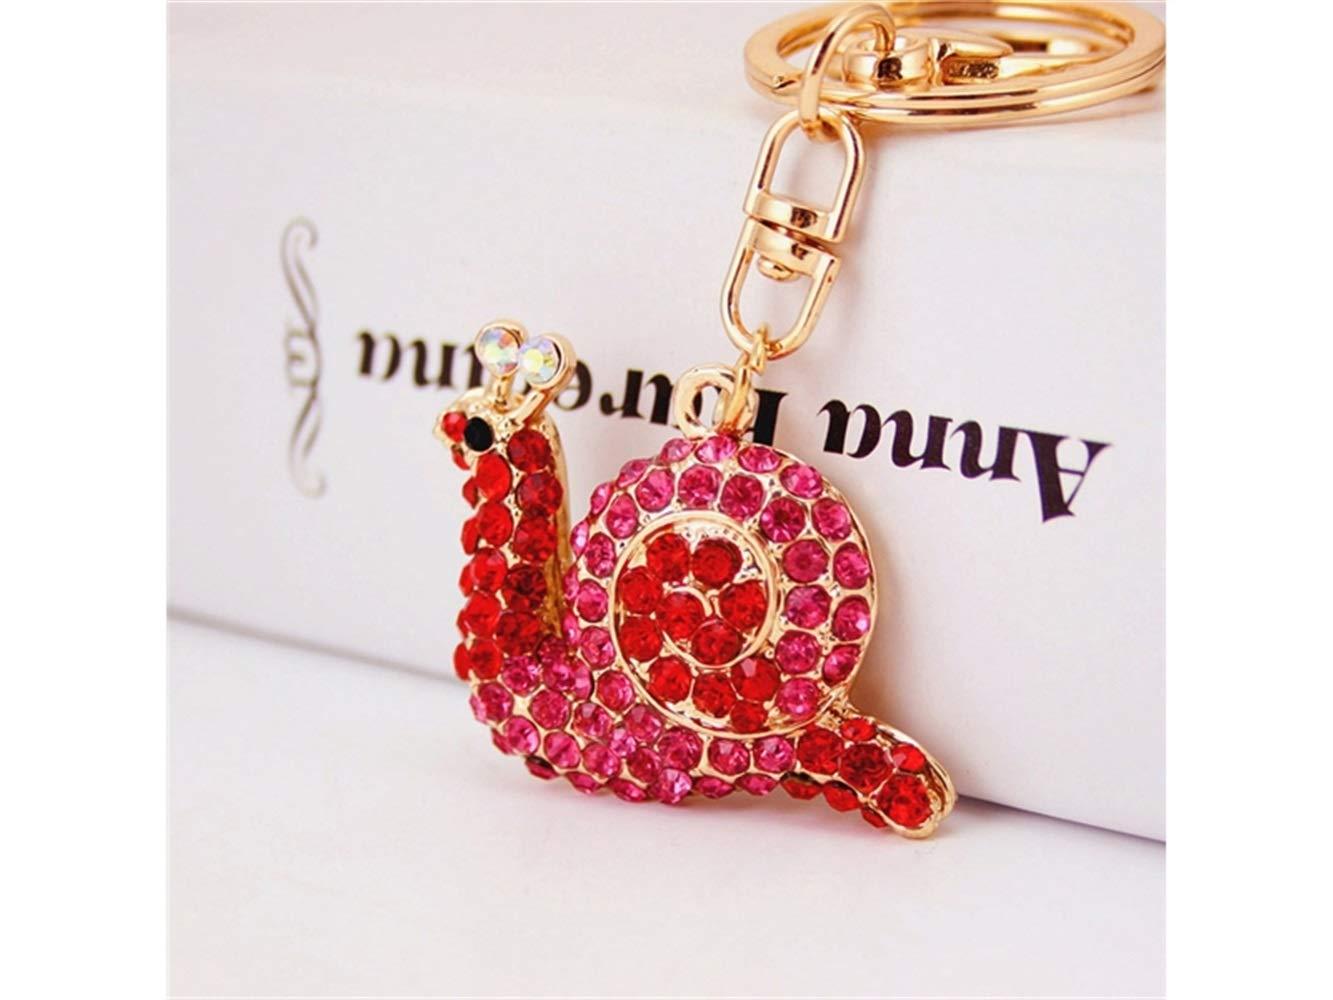 Car Keychain, Cute Small Snail Keychain Animal Key Trinket Car Bag Key Holder Decorations(Red) for Gift